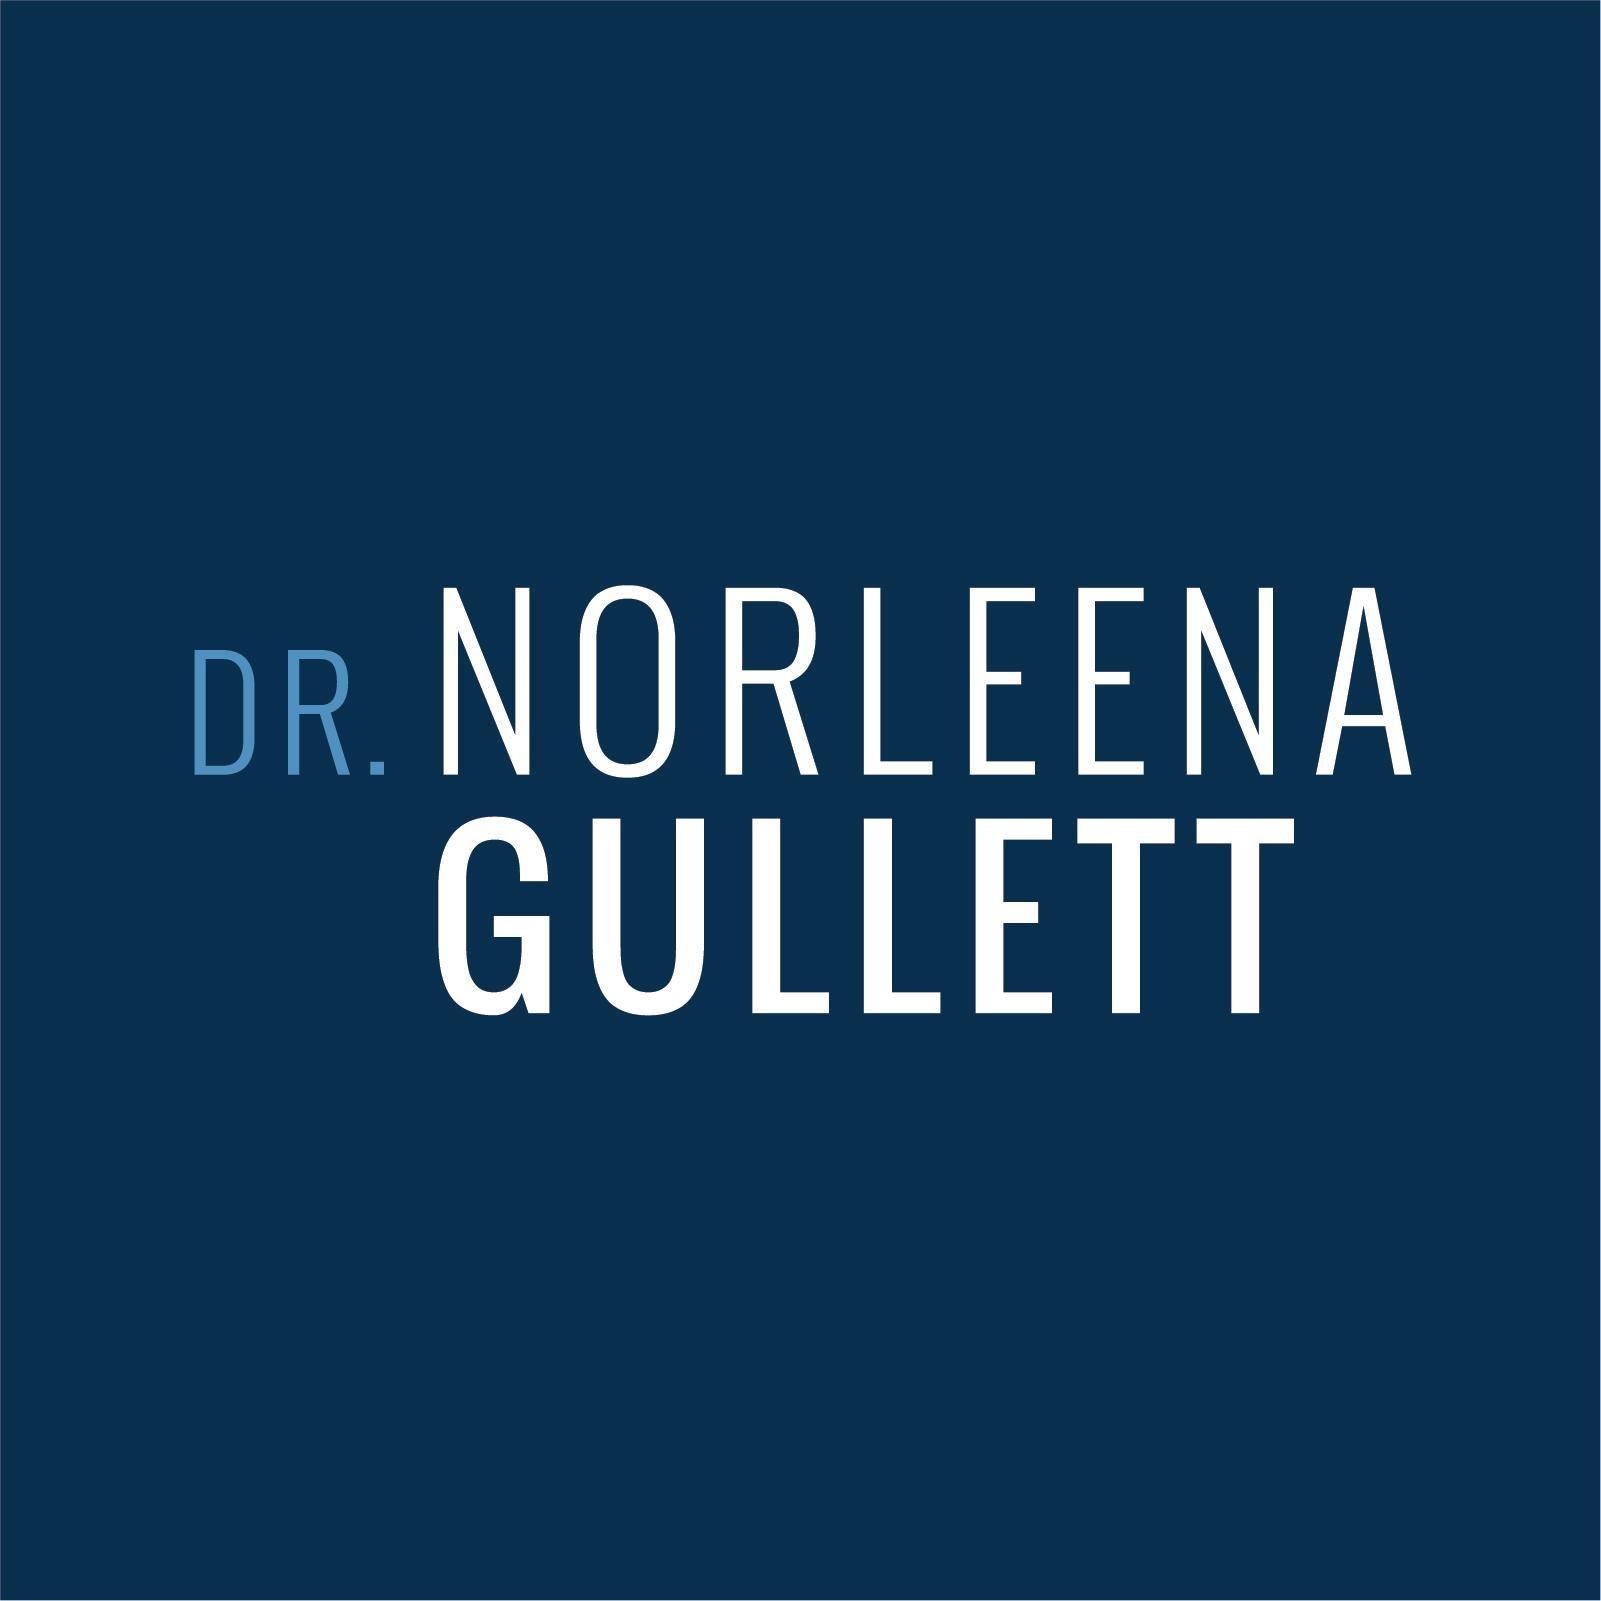 Dr. Norleena Gullett